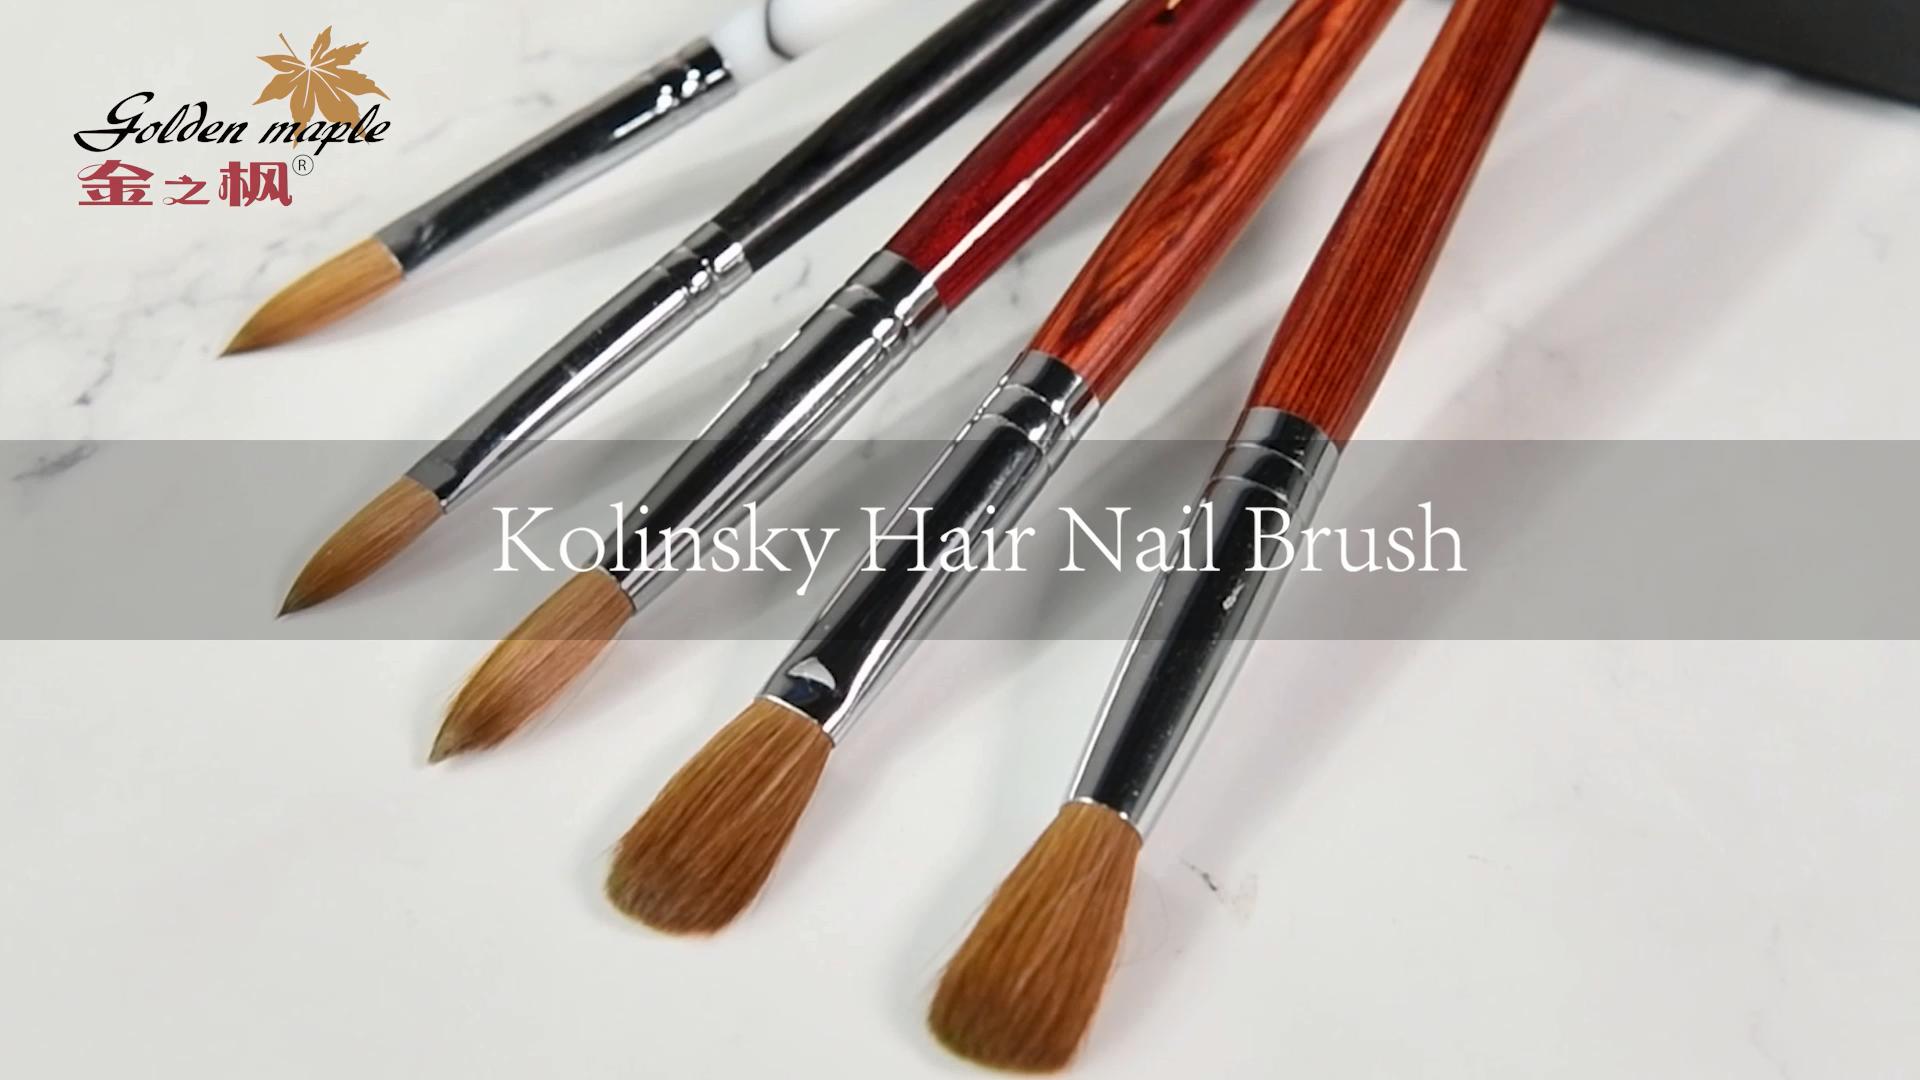 Fuumuui 100% pur kolinsky acrylique brosse à ongles avec poignée en acrylique 2 # ~ 24 #